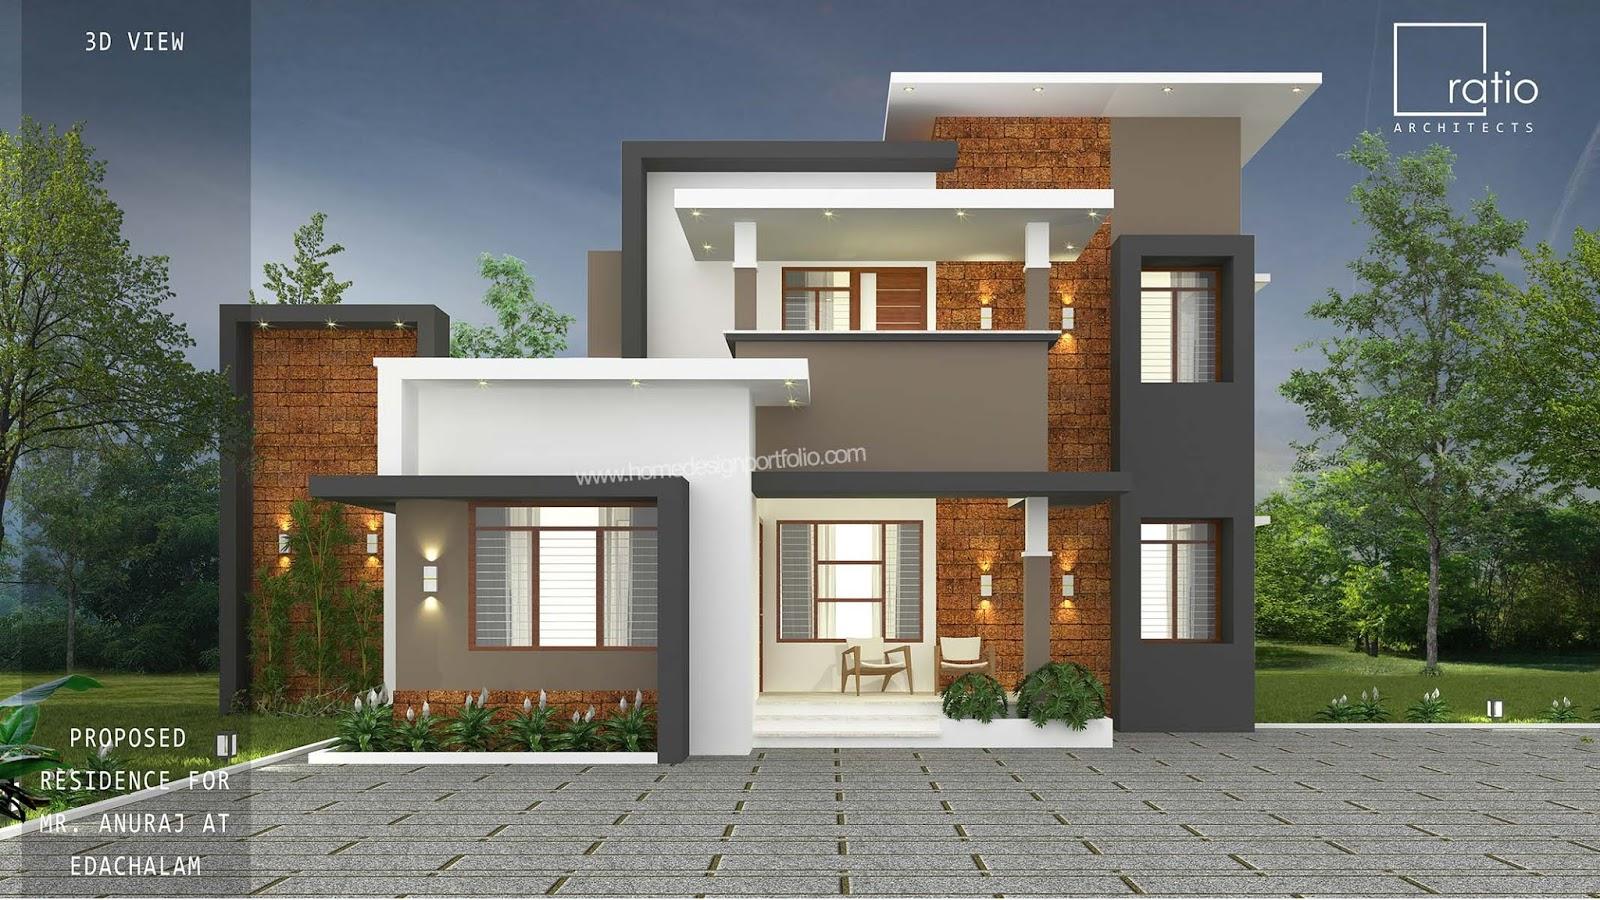 30 Lakh 1770 sq ft 4 Bedroom Malappuram Home design idea